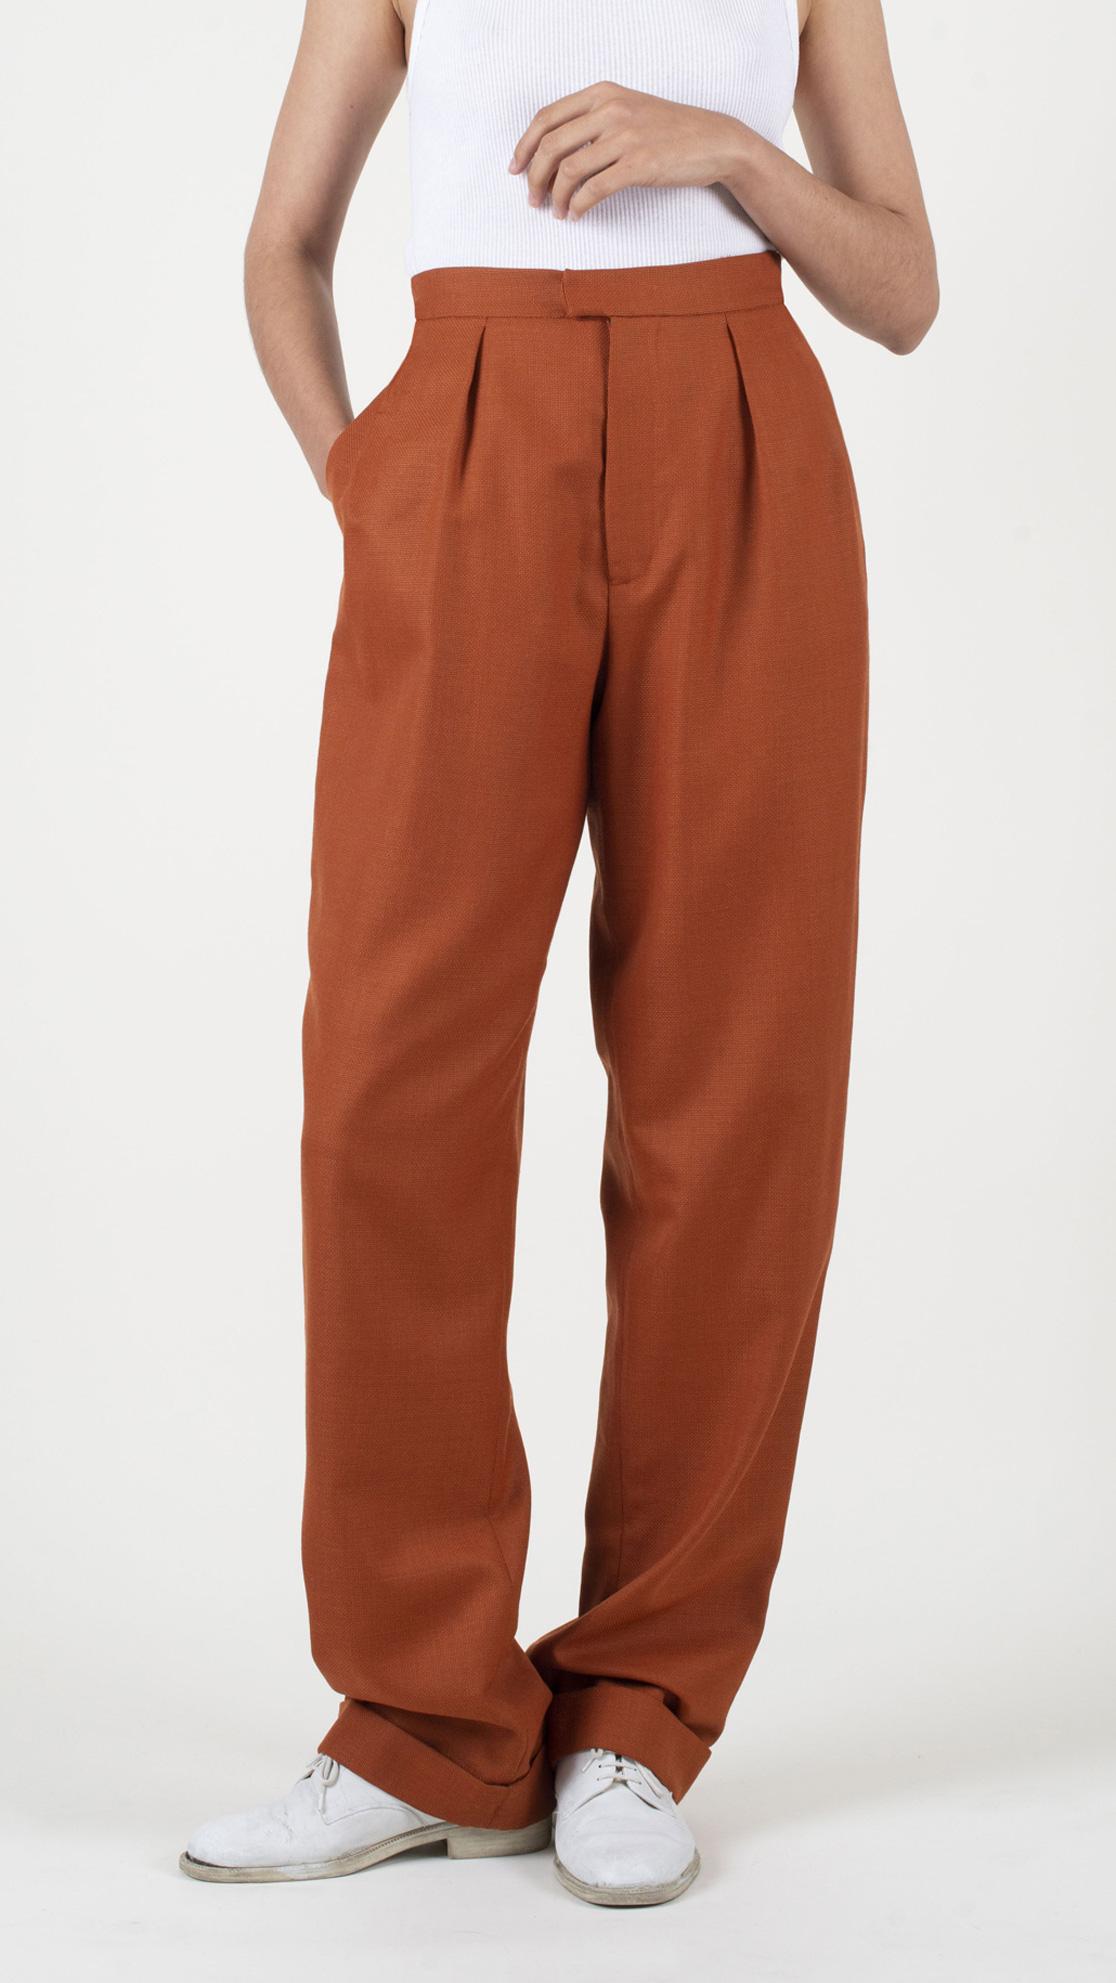 DADA-Diane-Ducasse-AH21-pantalon-droit-jules-laine-orange-face